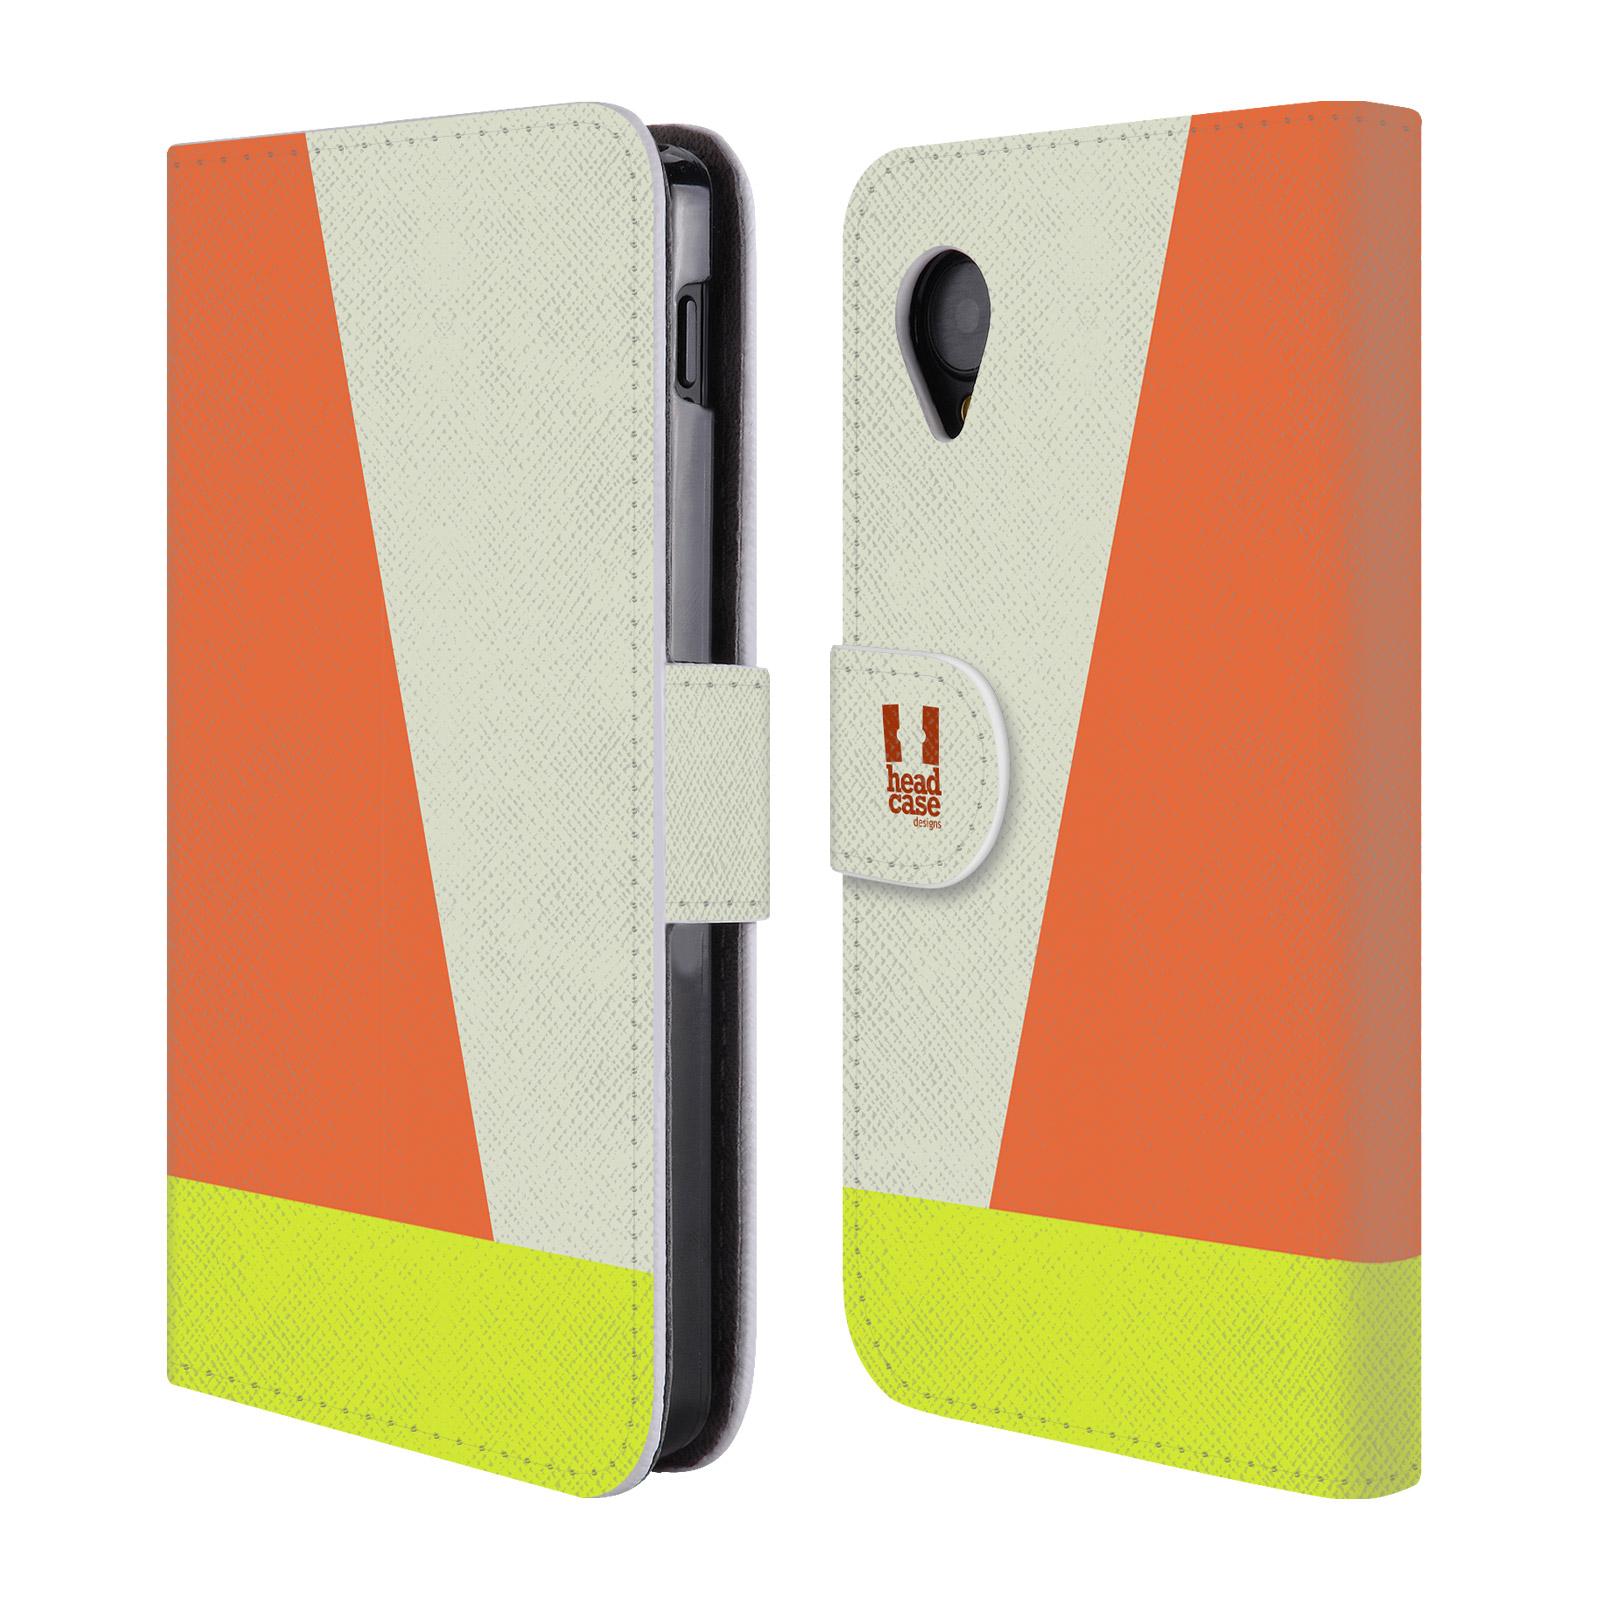 HEAD CASE Flipové pouzdro pro mobil LG GOOGLE NEXUS 5 barevné tvary slonová kost